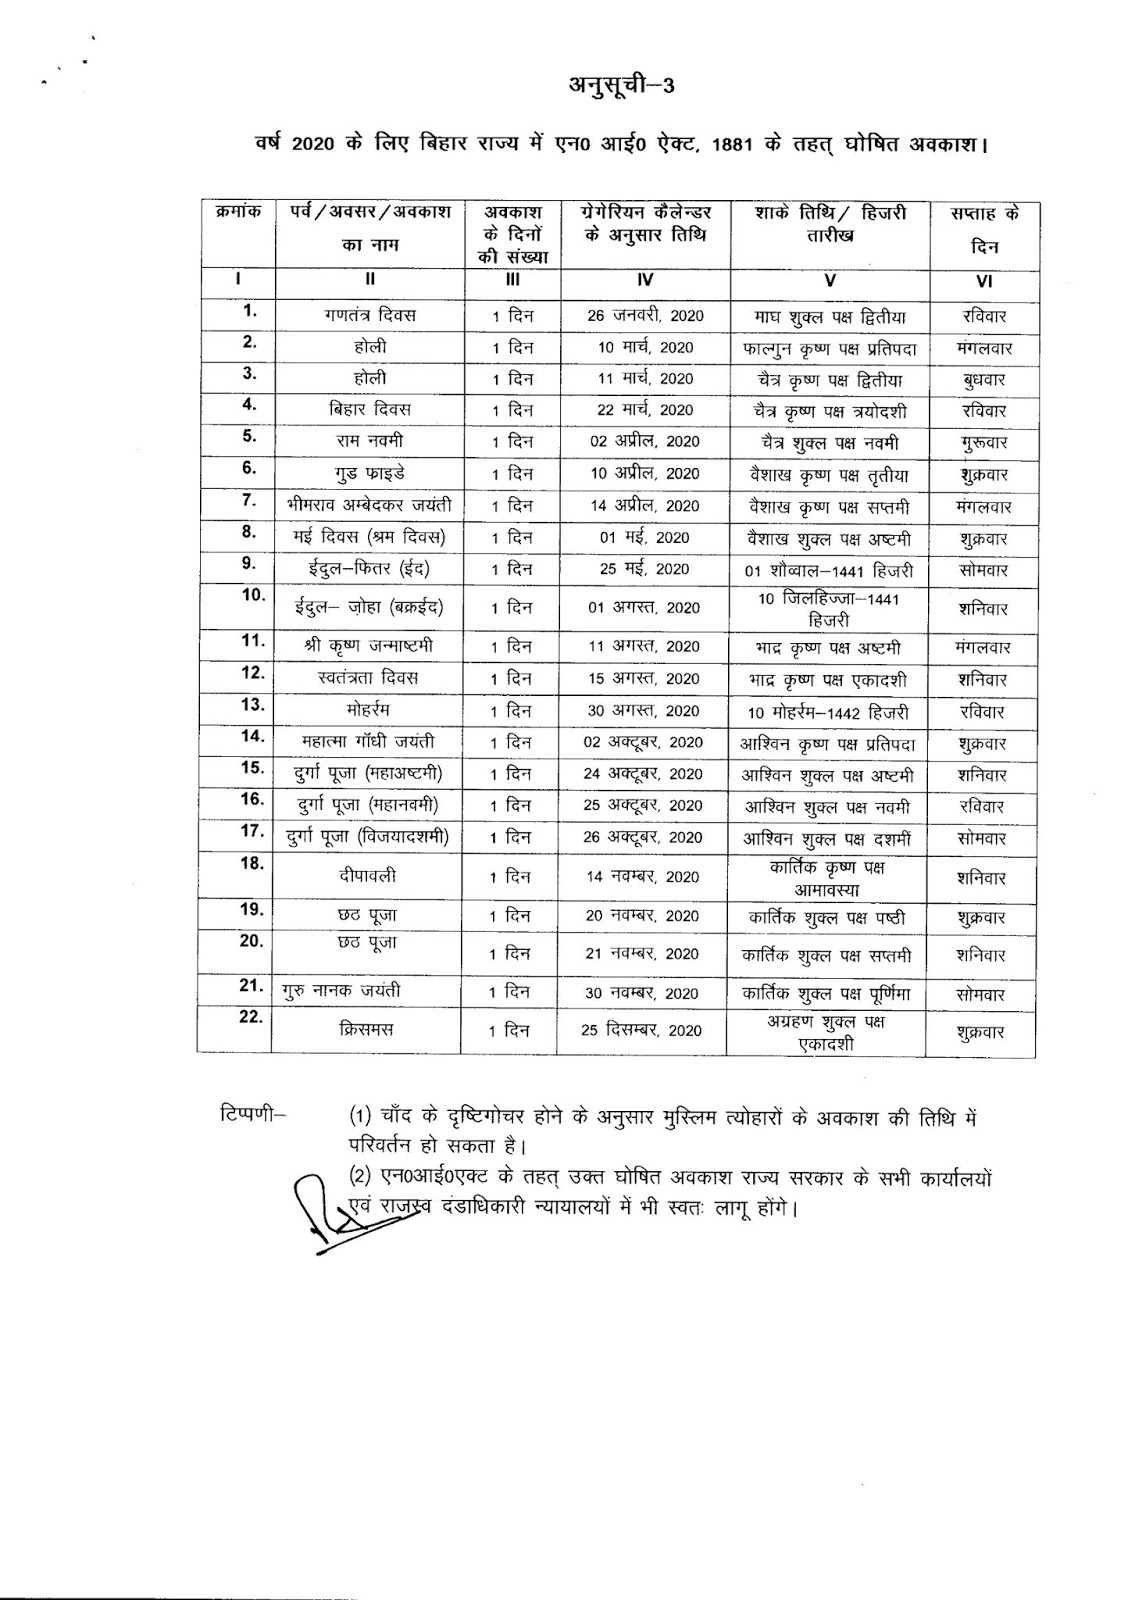 Bihar Government Calendar 2020 #educratsweb regarding Bihar Sarkar Calendra 2020